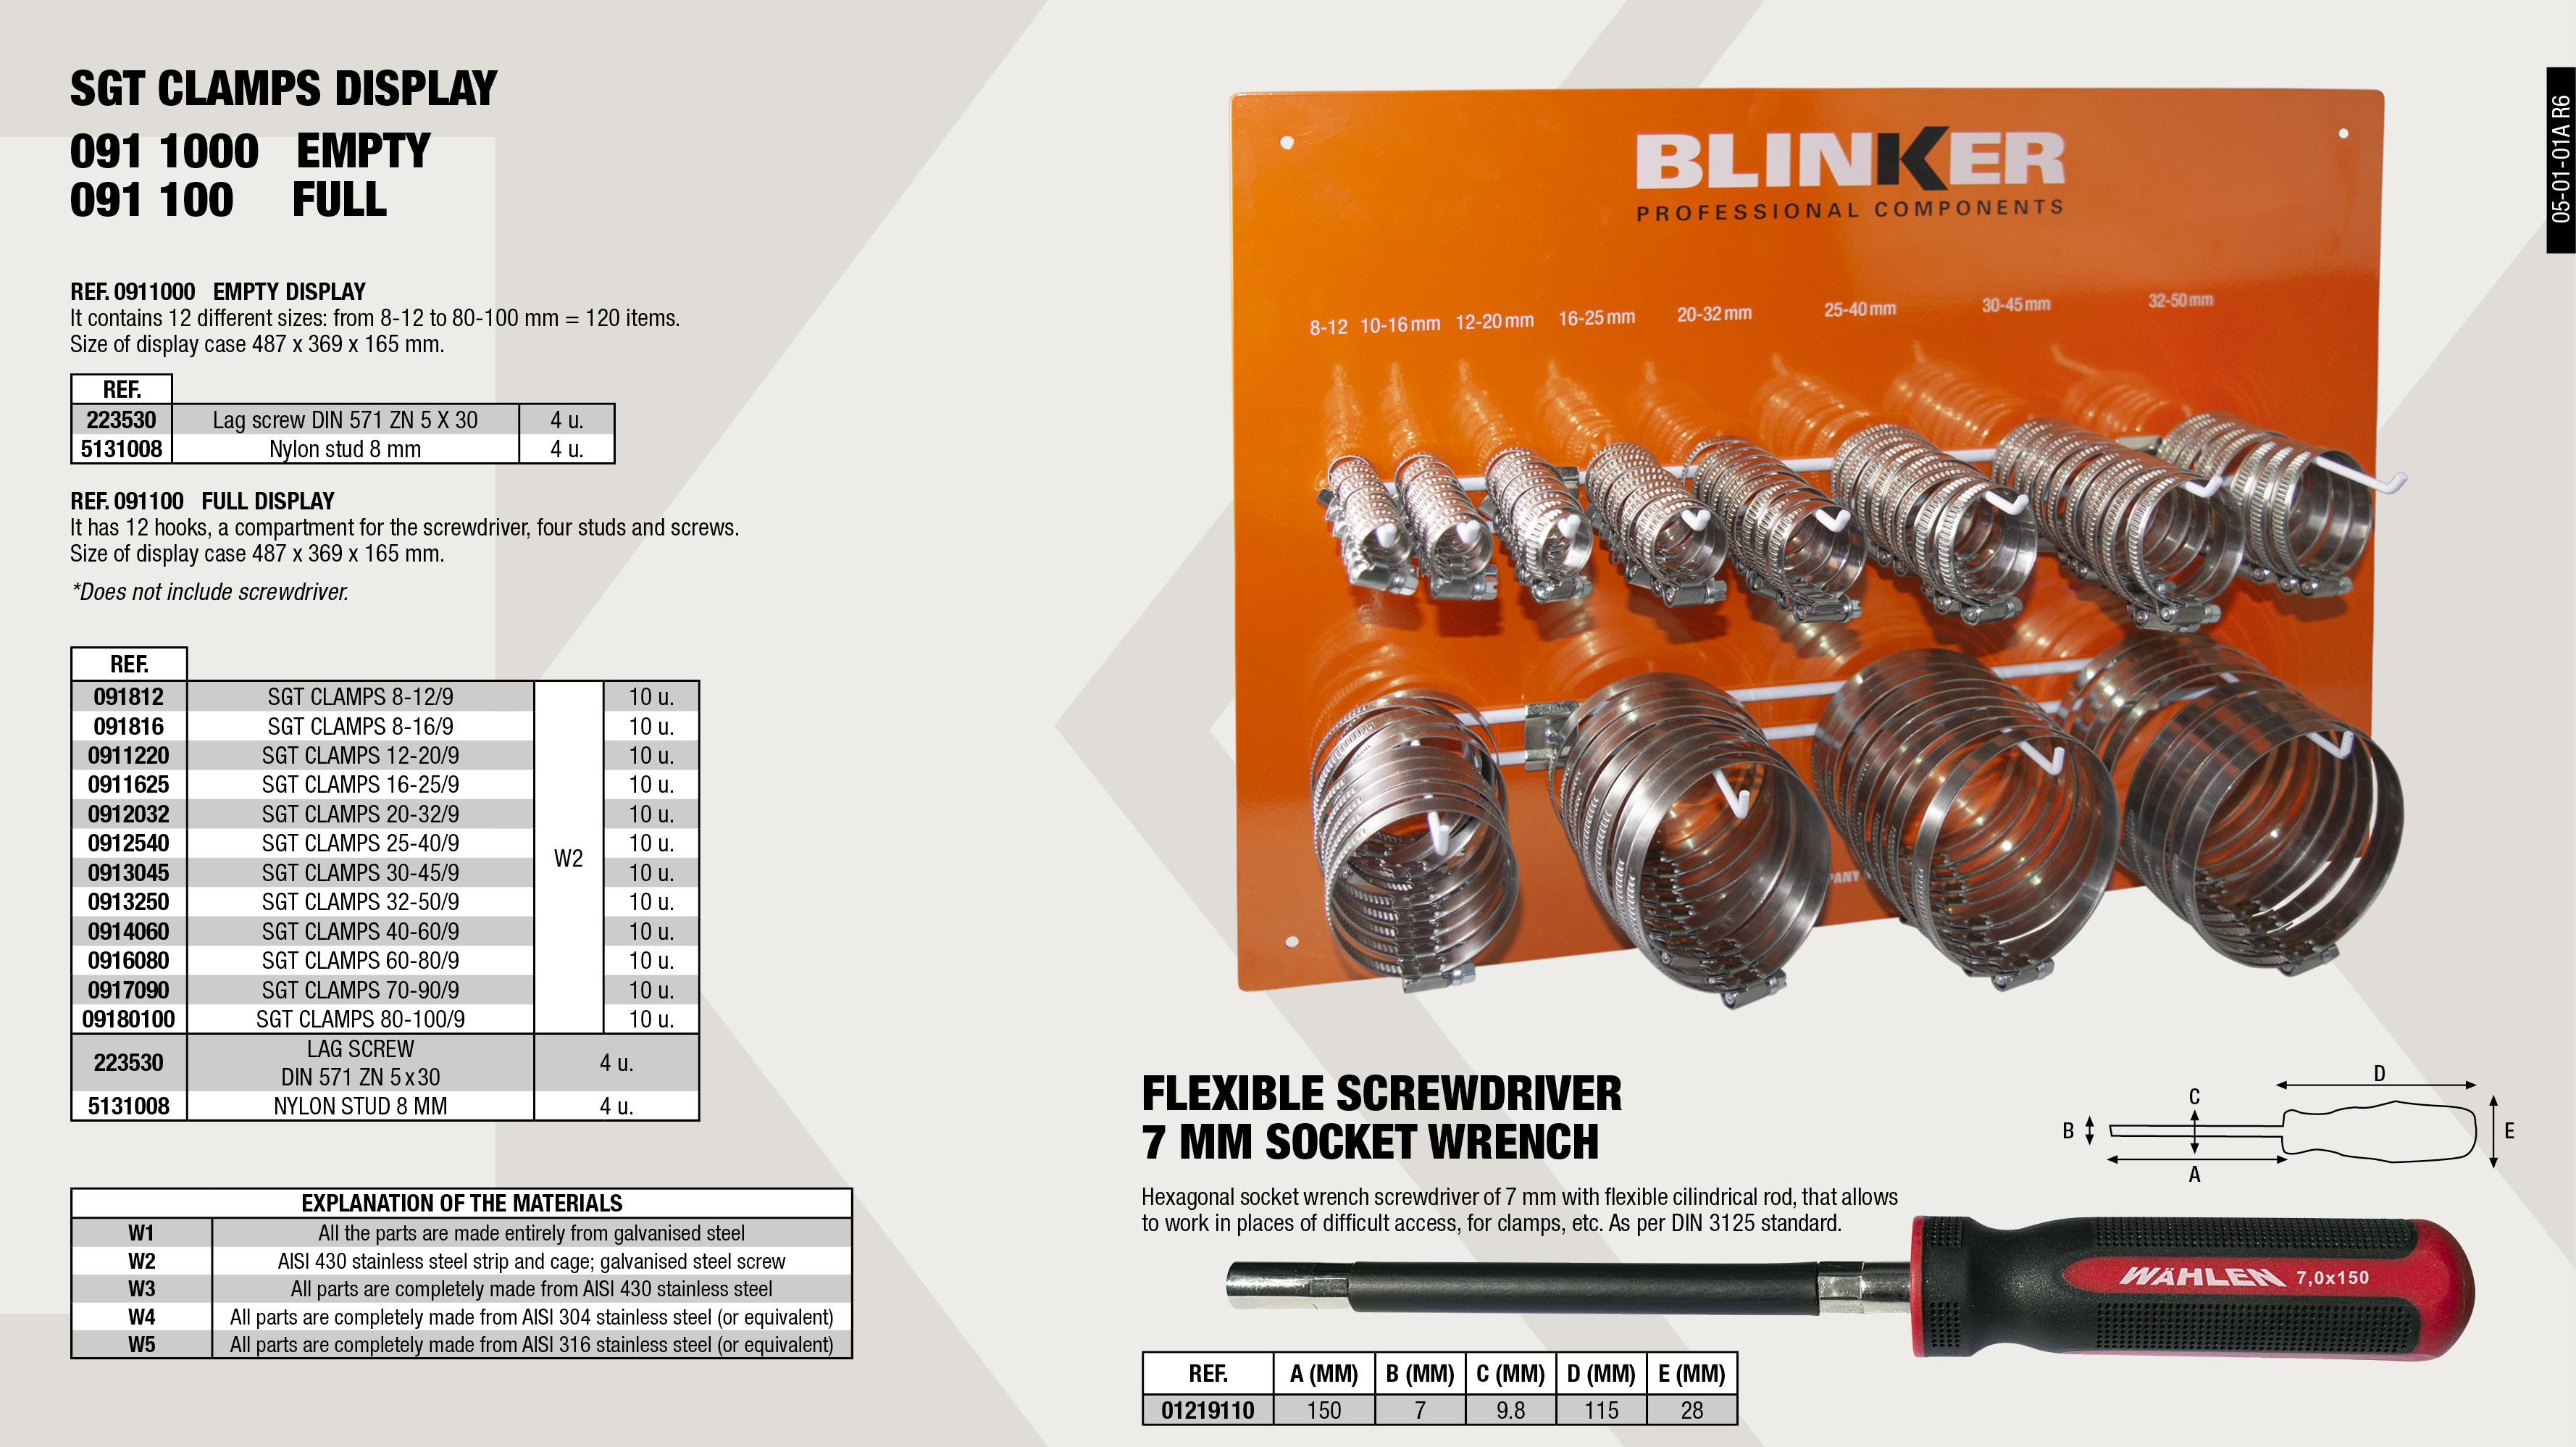 FLEXIBLE SCREWDRIVER SOCKET 7MM                             ,  SGT HOSE CLAMP 12-20/9 W2 BLINKER                           ,  SGT HOSE CLAMP 32-50/9 W2 BLINKER                           ,  NYLON PLUG WITH LIP 8MM                                     ,  SGT HOSE CLAMP 20-32/9 W2 BLINKER                           ,  SGT HOSE CLAMP 80-100/9 W2 BLINKER                          ,  COMPLETE 7.5-9MM SGT HOSE CLAMPS DISPLAY                    ,  SGT HOSE CLAMP 16-25/9 W2 BLINKER                           ,  SGT HOSE CLAMP 70-90/9 W2 BLINKER                           ,  COACH WOOD SCREW HEX HEAD DIN 571 ZN.5X30                   ,  SGT HOSE CLAMP 40-60/9 W2 BLINKER                           ,  SGT HOSE CLAMP 8-12/7.5 W2 BLINKER                          ,  SGT HOSE CLAMP 30-45/9 W2 BLINKER                           ,  EMPTY 7.5-9MM SGT HOSE CLAMPS W/ANCHORS DISPLAY             ,  SGT HOSE CLAMP 25-40/9 W2 BLINKER                           ,  SGT HOSE CLAMP 60-80/9 W2 BLINKER                           ,  SGT HOSE CLAMP 8-16/9 W2 BLINKER                            ,